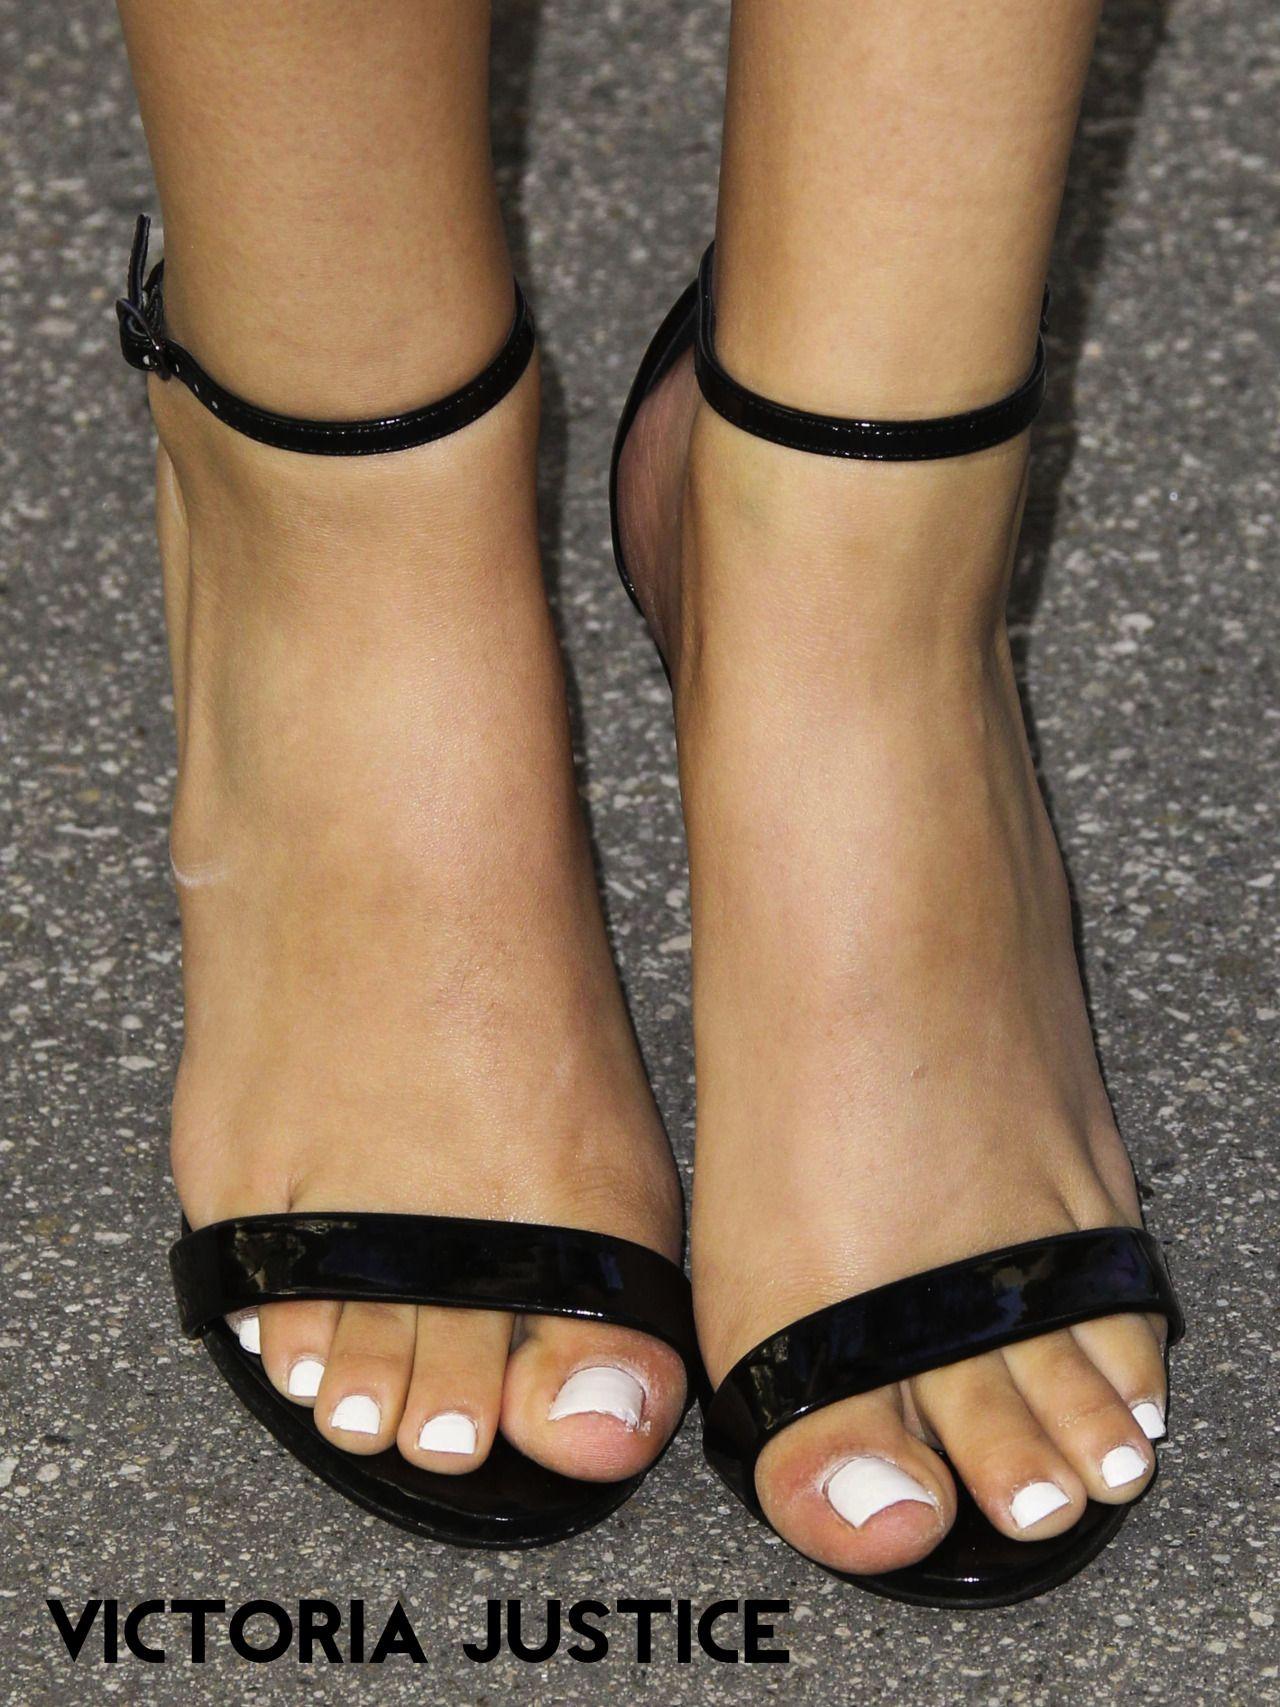 sexy feet on tv